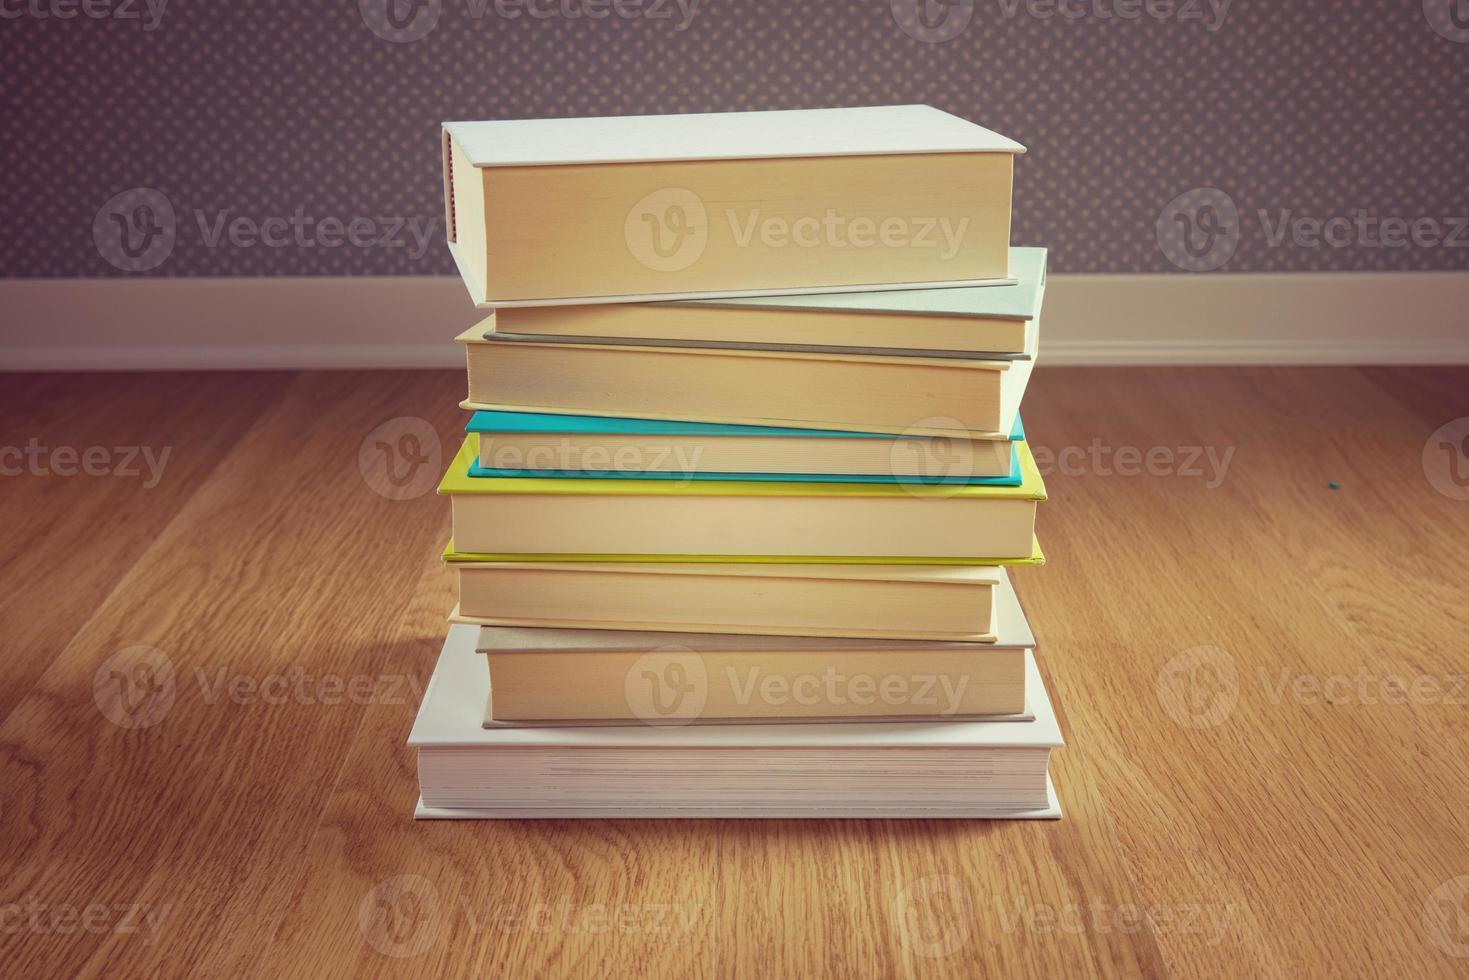 bunt böcker på golvet foto